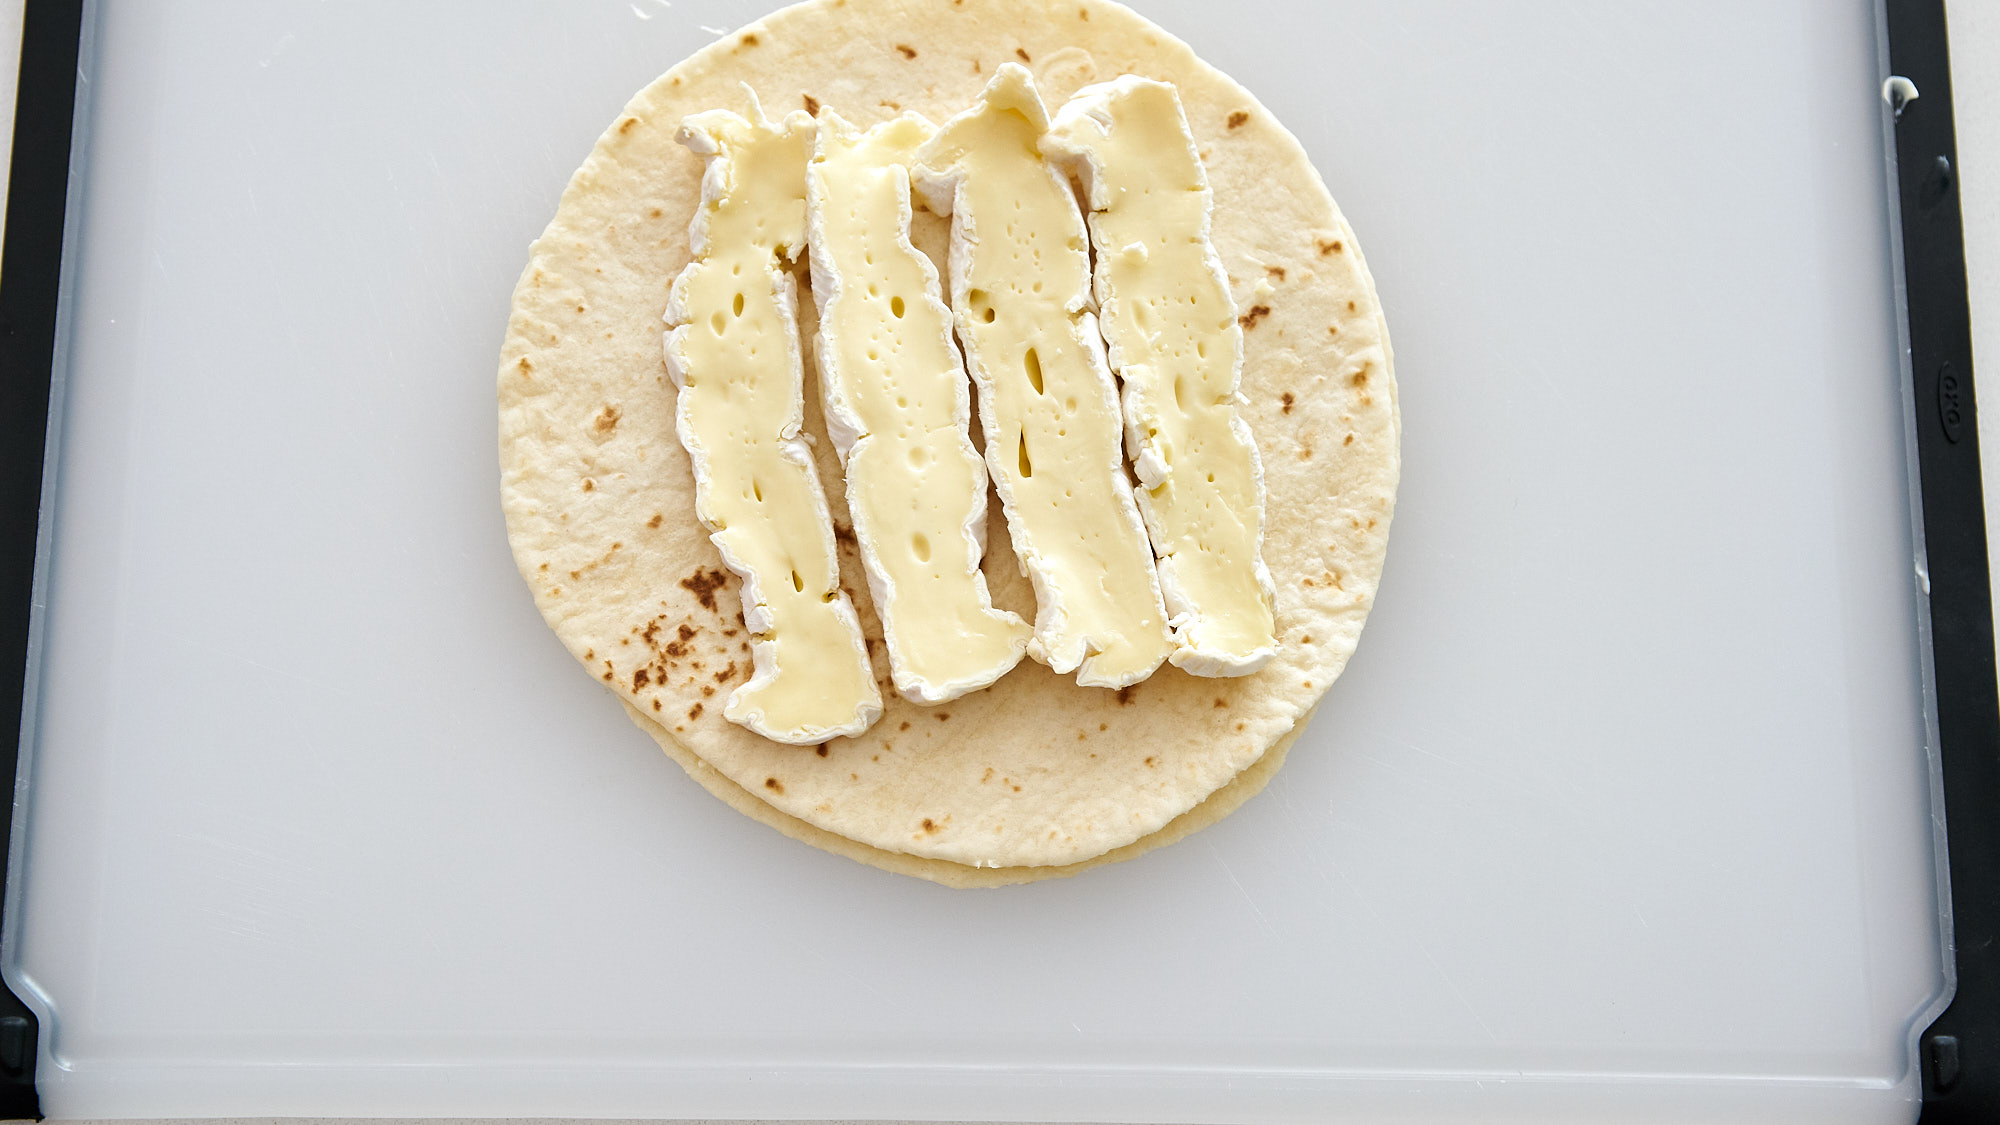 Brie and Blackberry Quesadilla